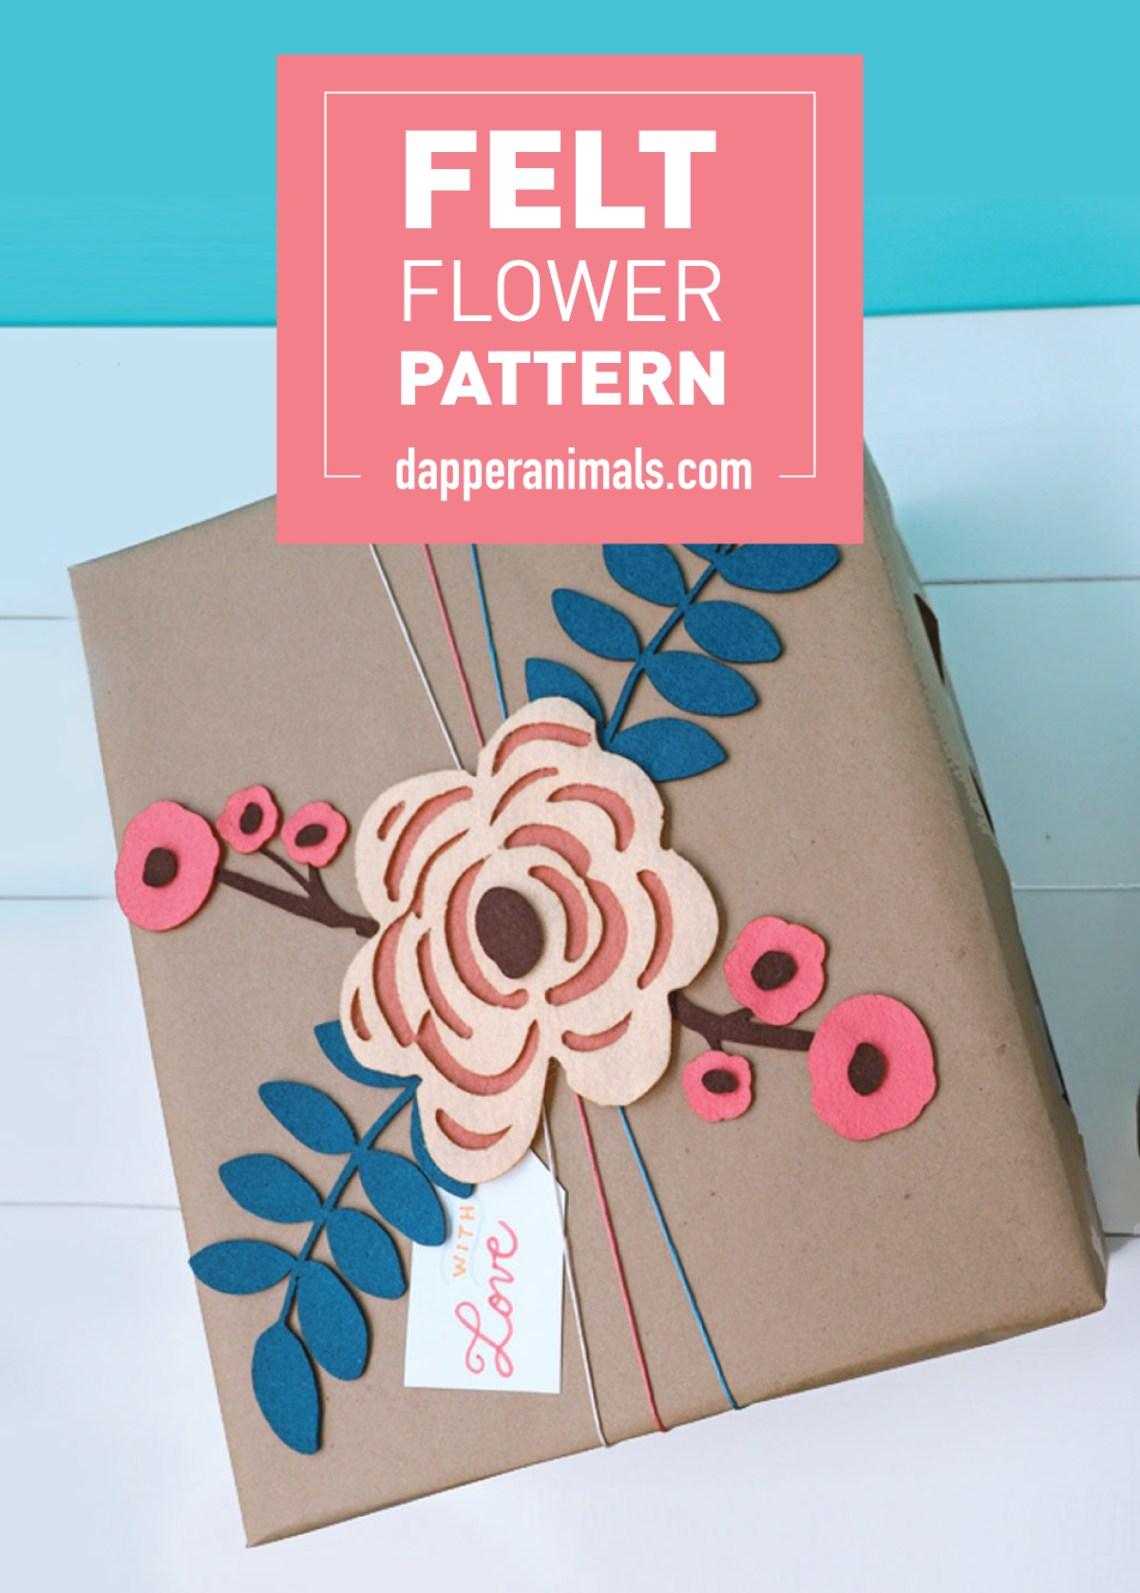 Felt Flower Pattern to add detail to gift wrap tutorial